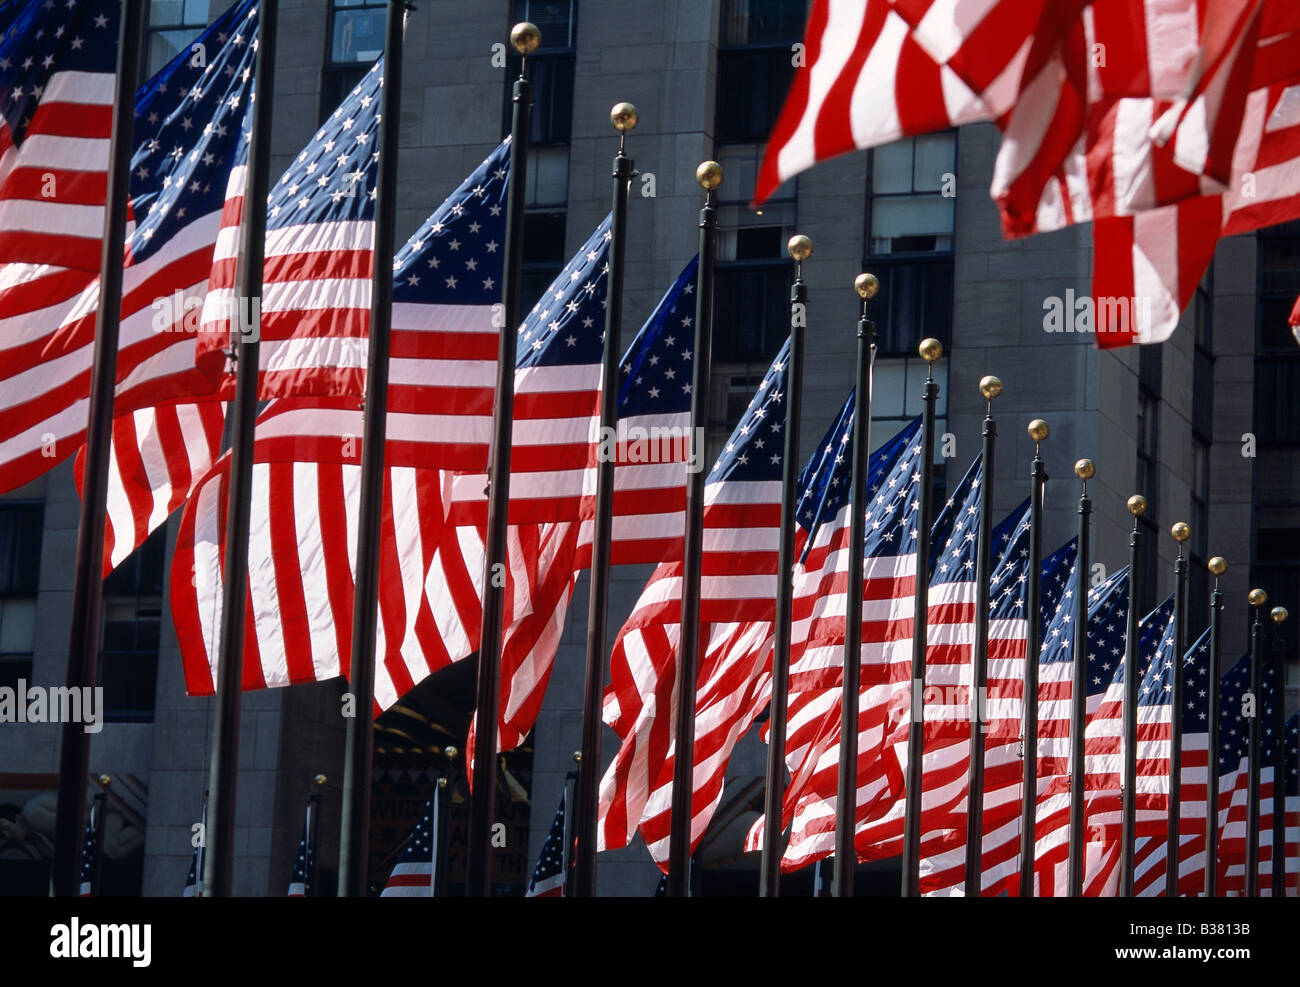 Line Of American Flag Wiring Diagrams Figure 614sample Diagram Flags Stock Photo 19230831 Alamy Rh Com Break